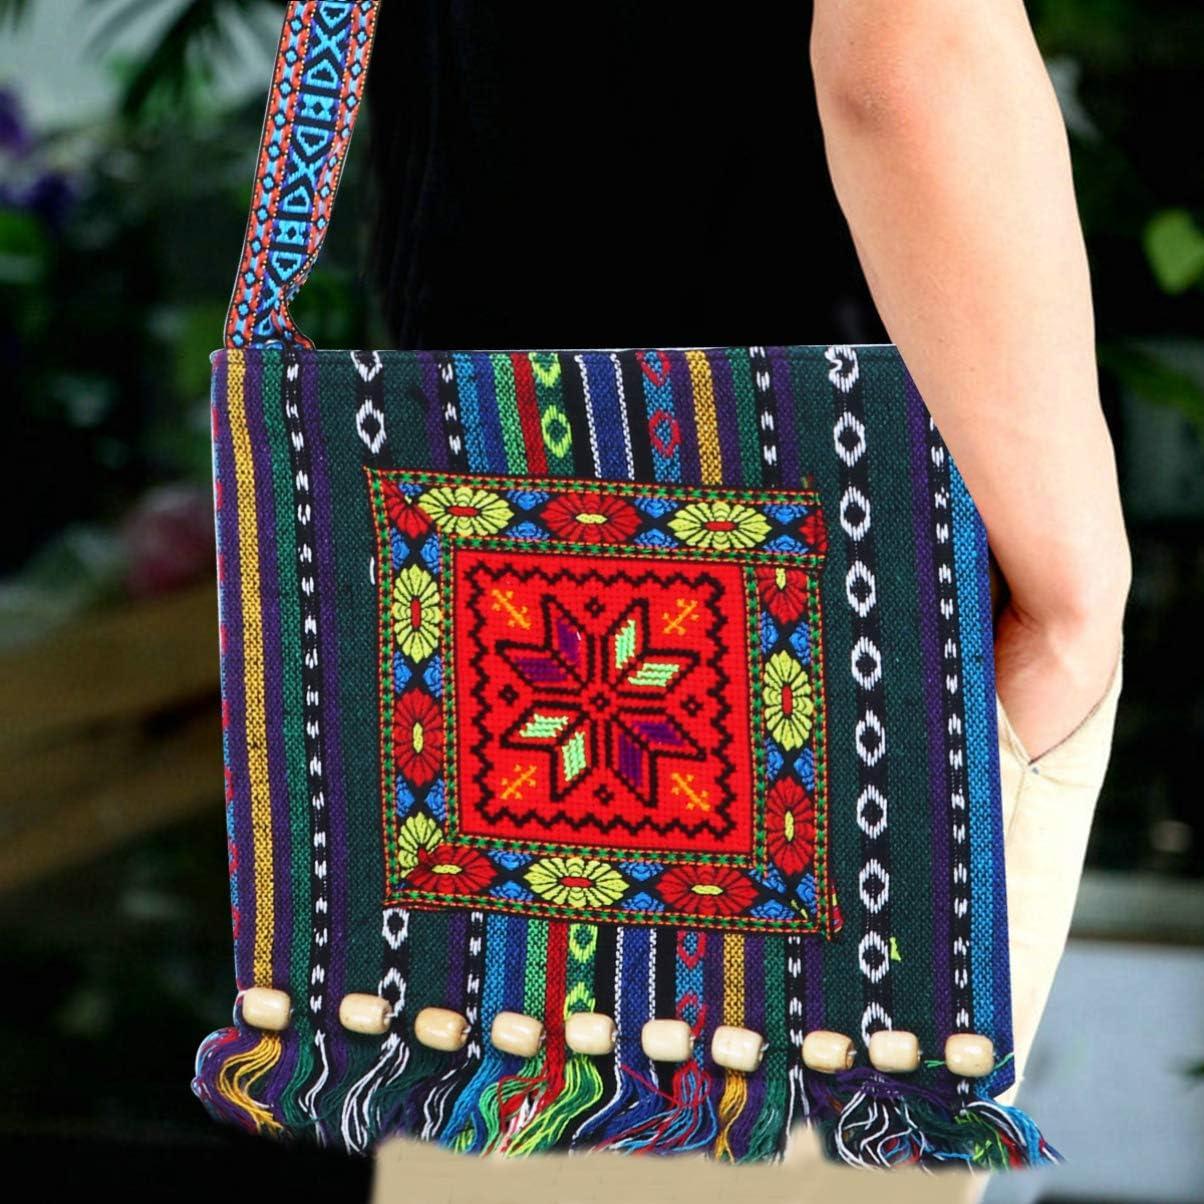 camelia TENDYCOCO borsa a tracolla boho hippie vintage tracolla con nappe ricamata tribale etnica vintage per donne ragazze